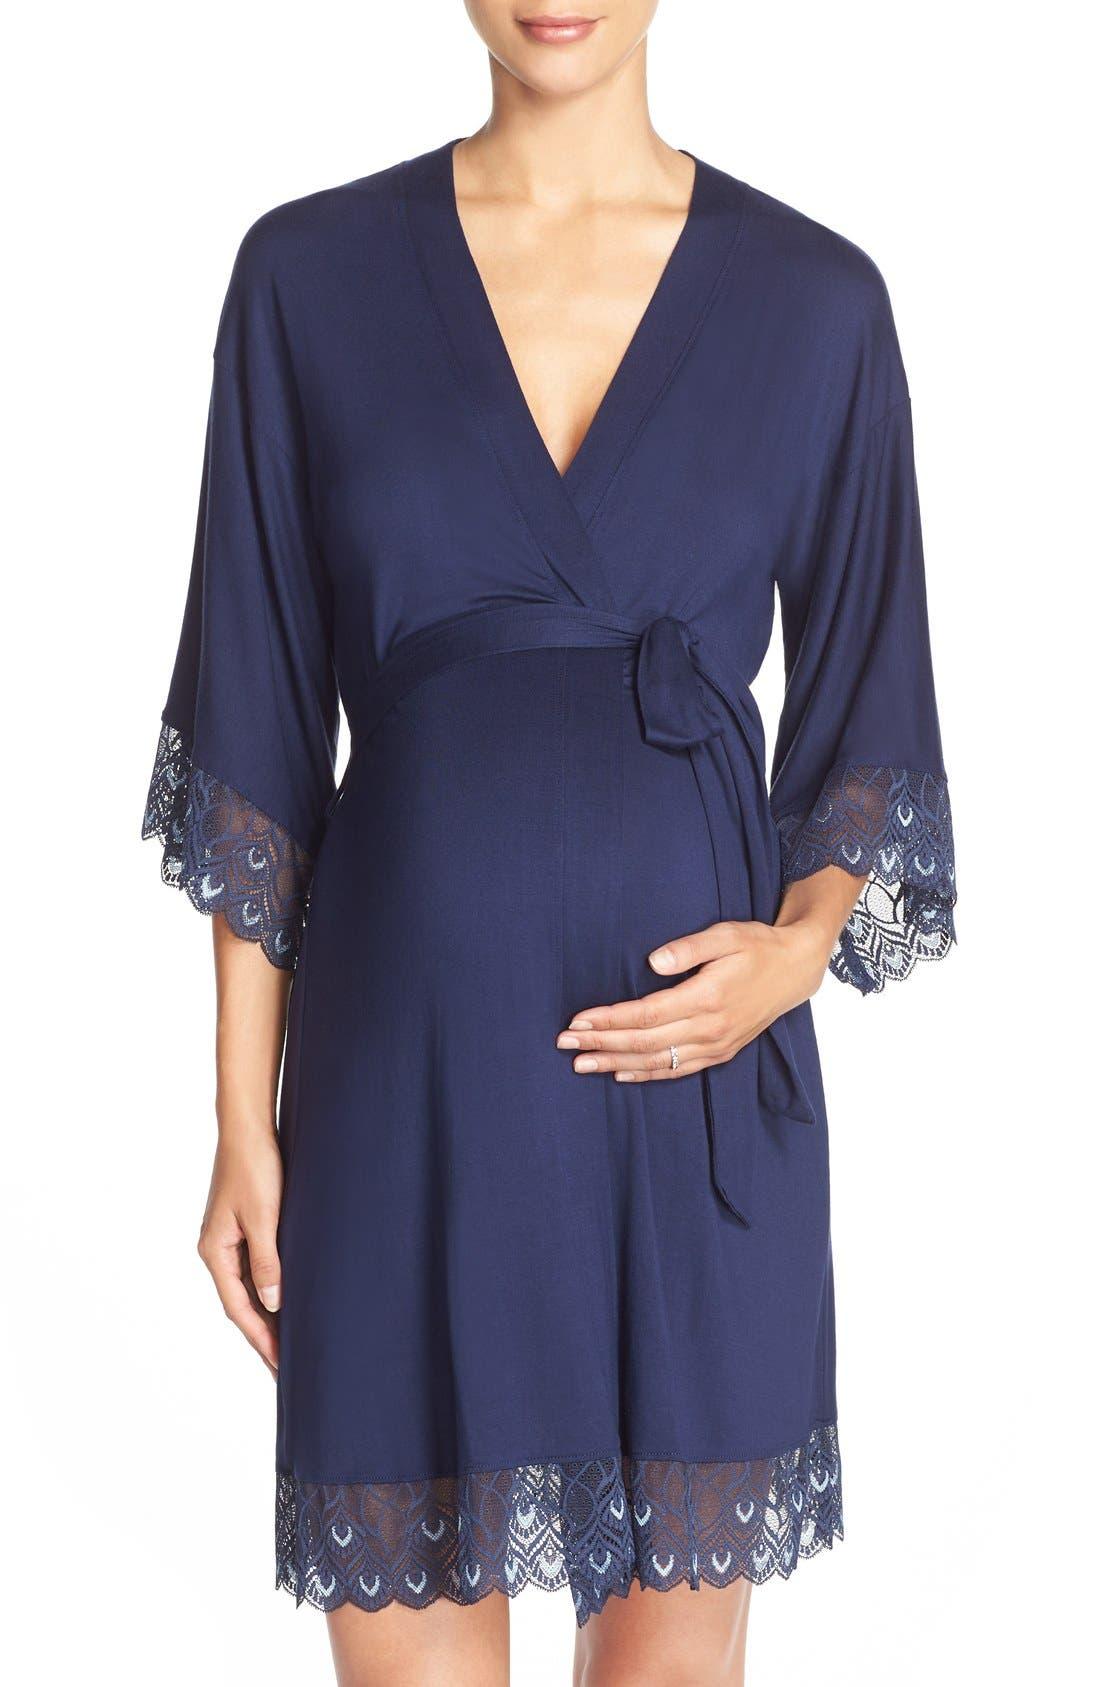 Belabumbum 'Tallulah' Maternity Jersey Robe